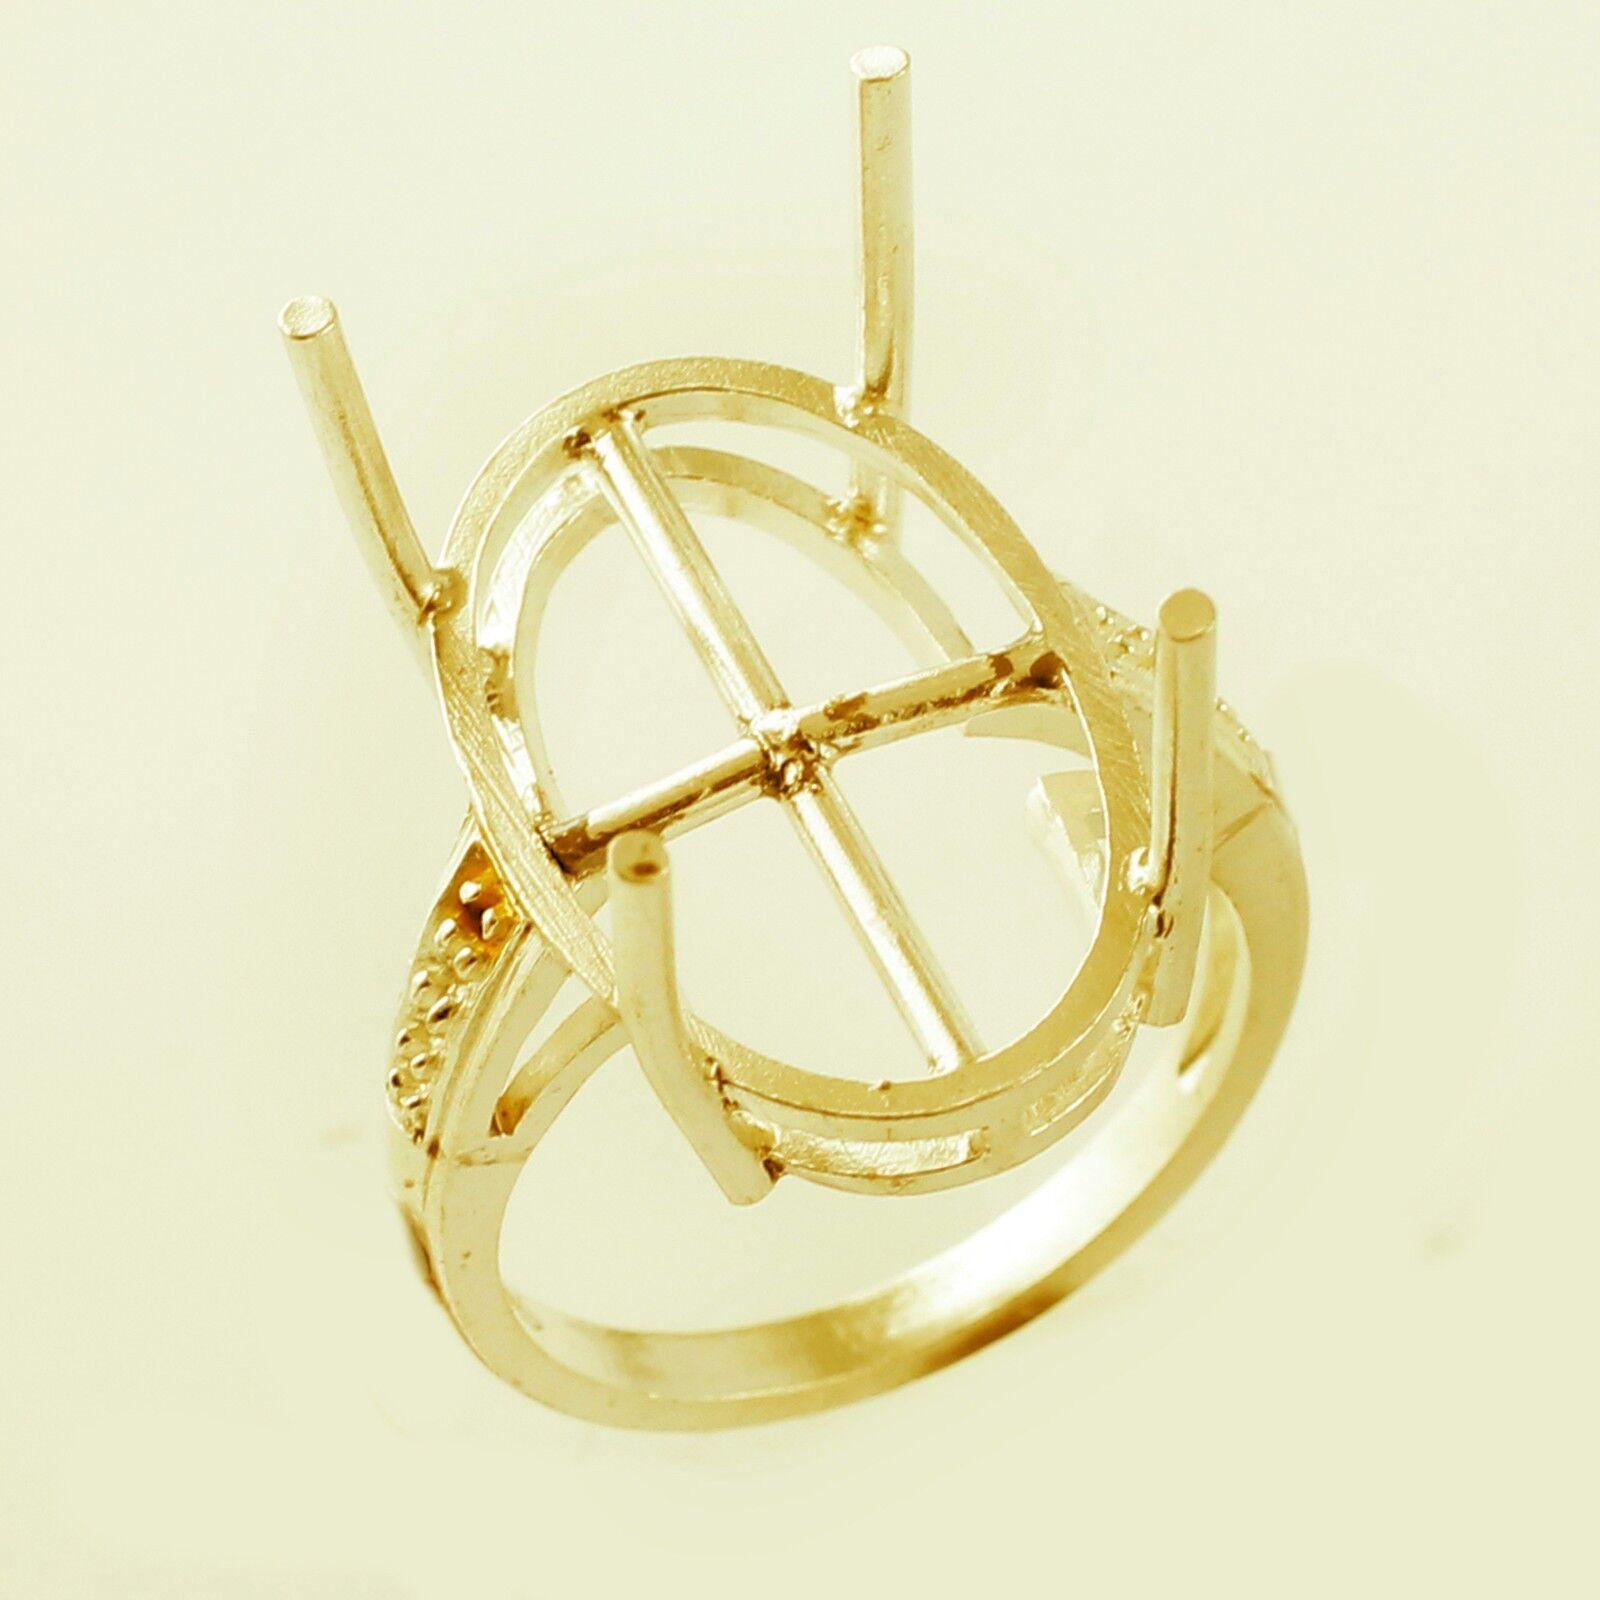 Oval Shape Semi Mount Ring 14x22 MM Eternity gold Stunning Lady Exotic Jewelry